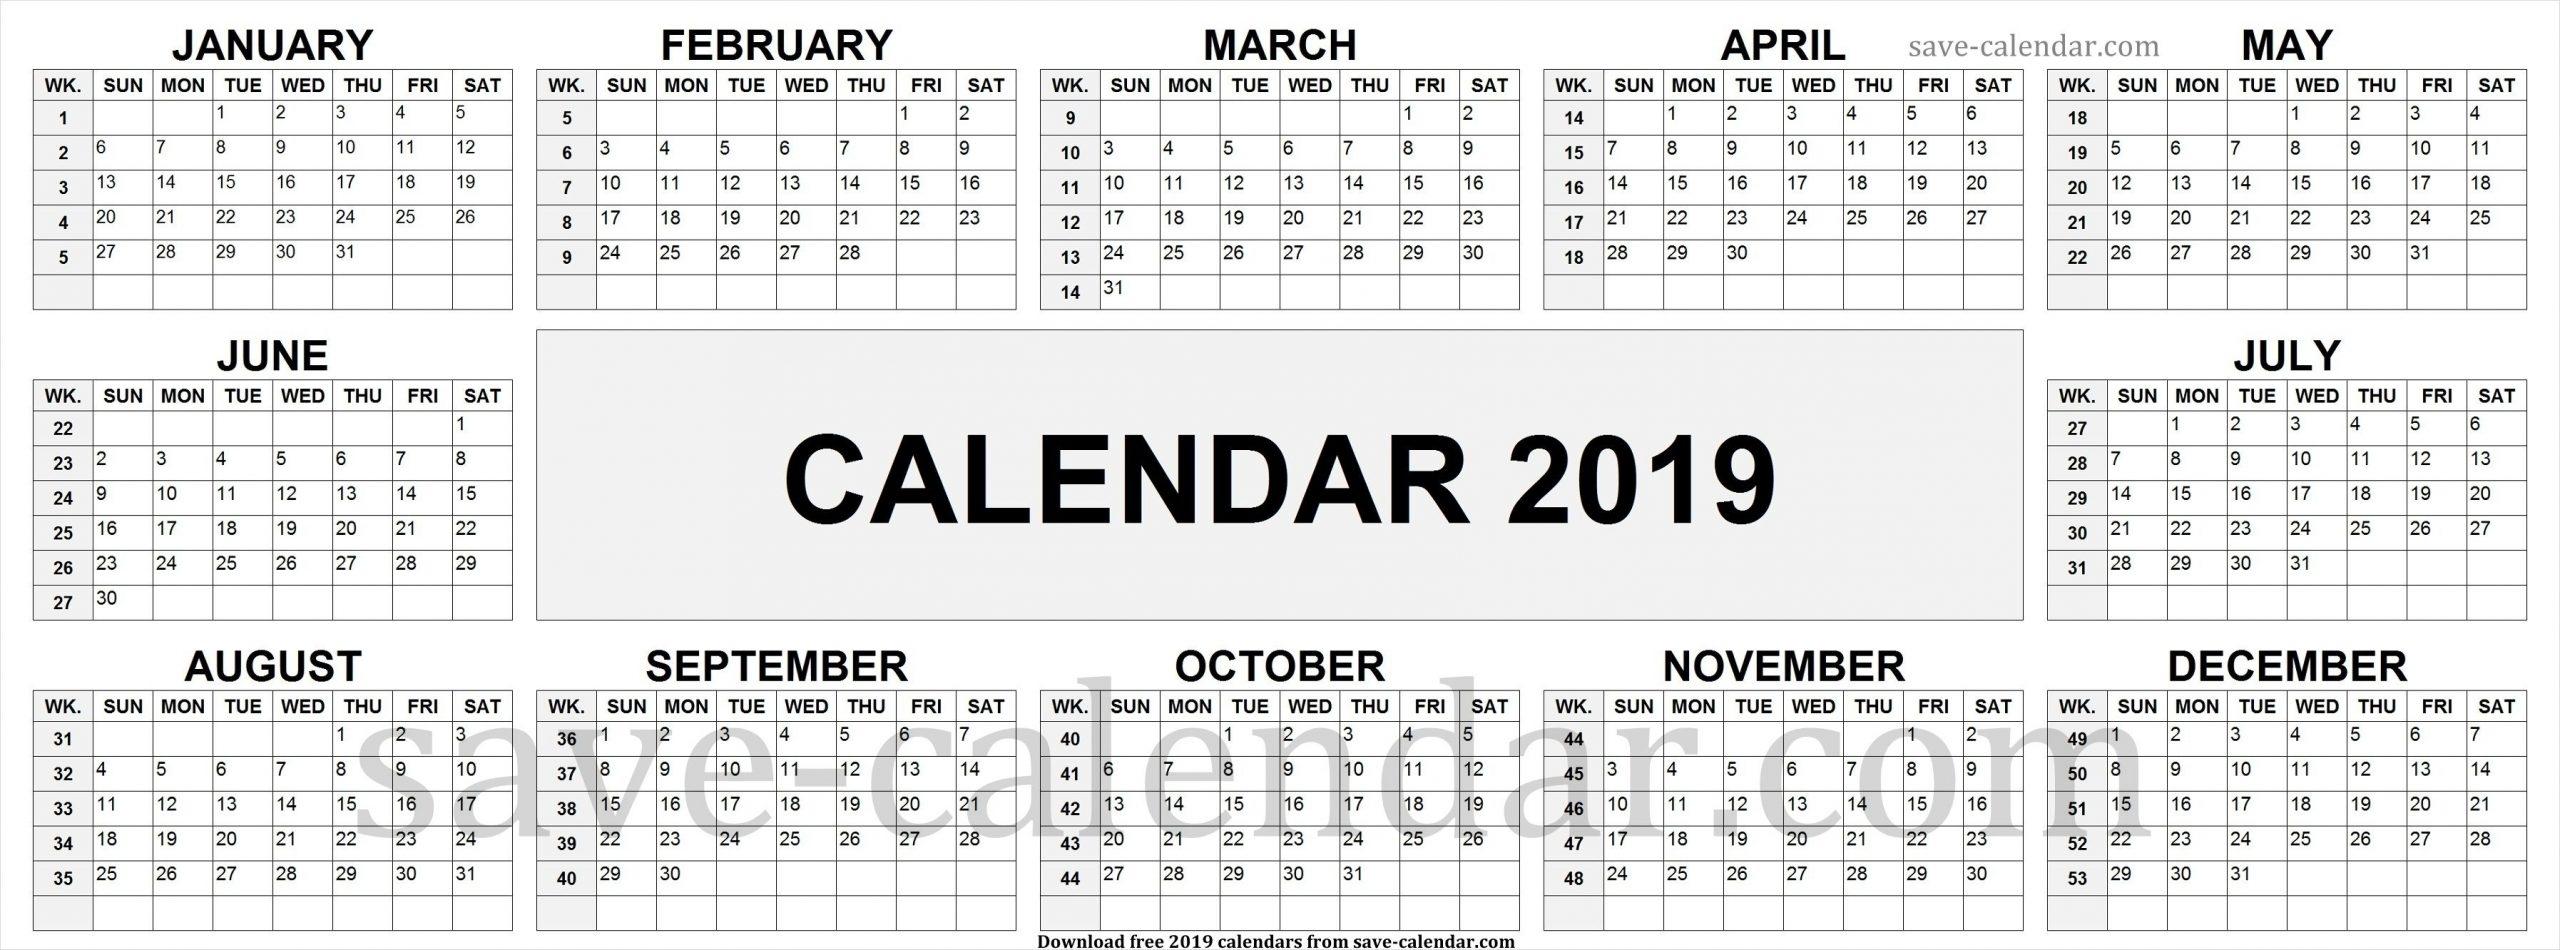 Take Depo Provera Perpetual Calendar 2020 | Calendar Printables Free Blank